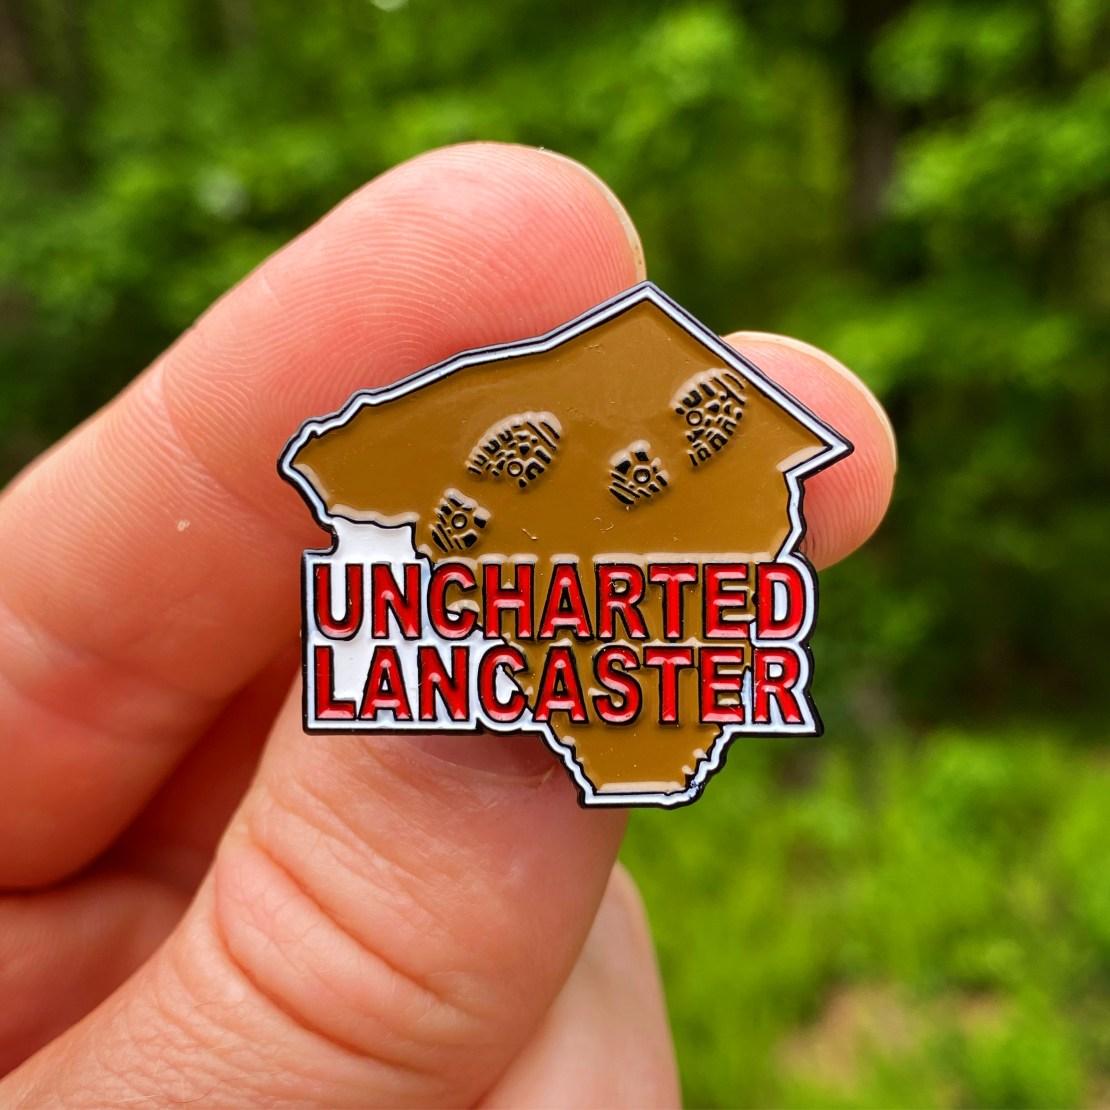 unchartedLancasterPin1